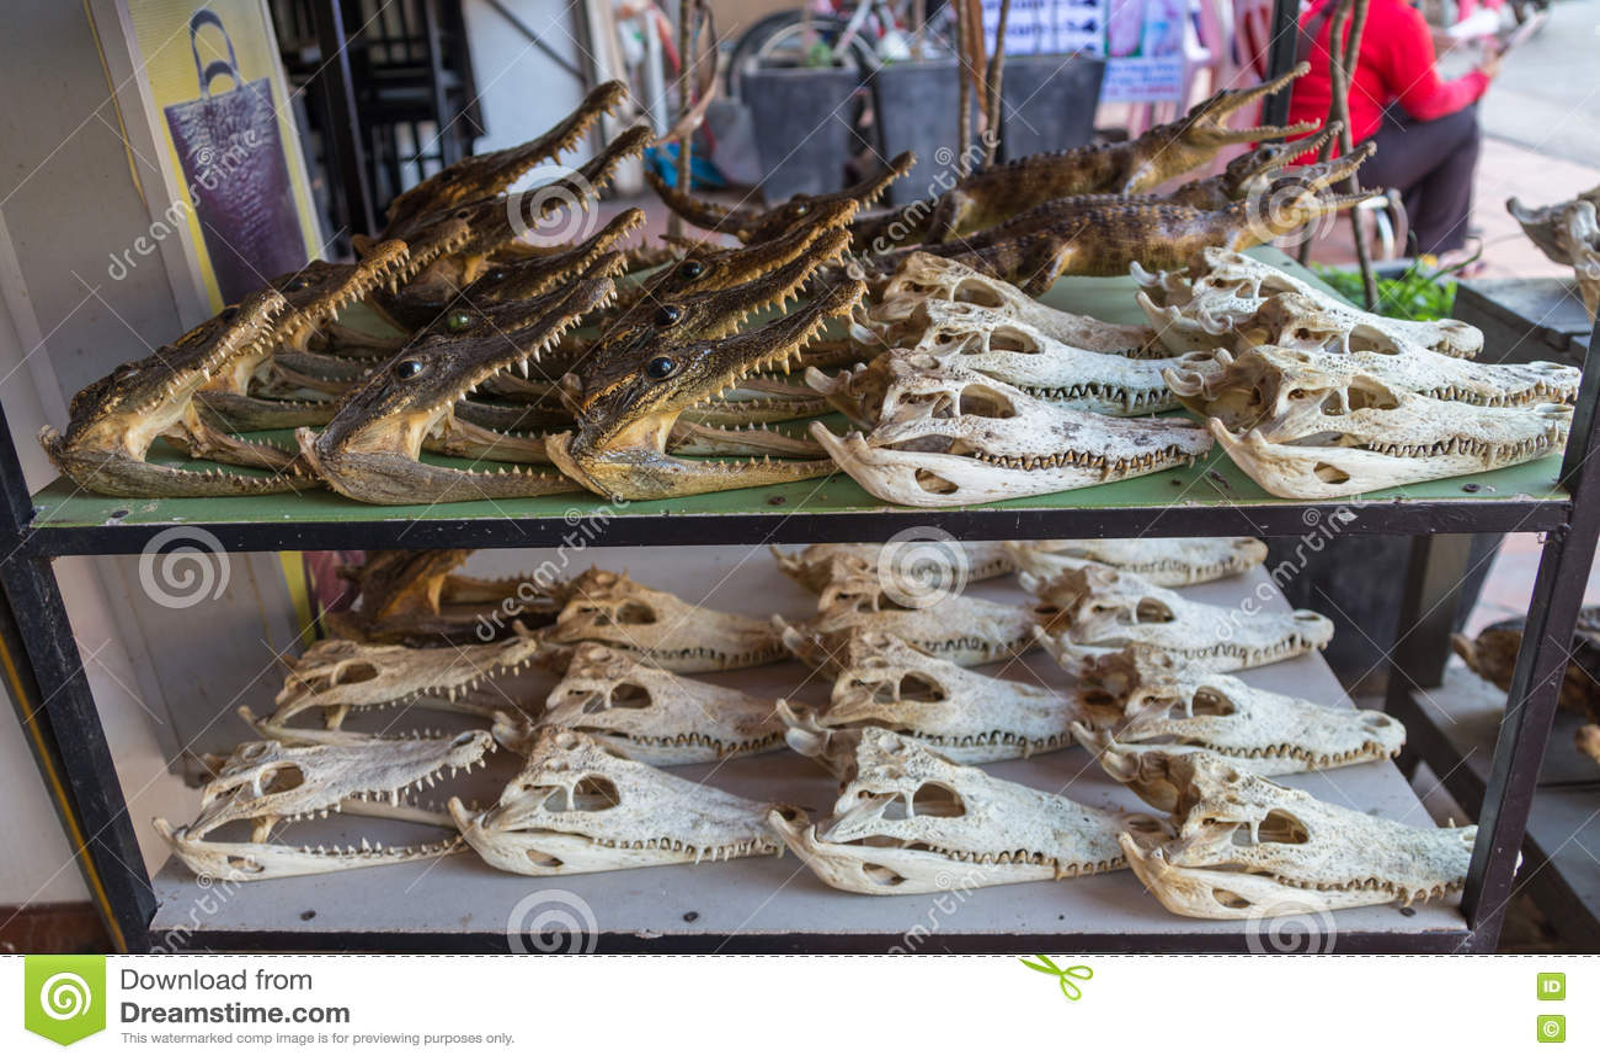 Crocodile Skull On Counter Stock Photo Image Of Anatomy 74504756